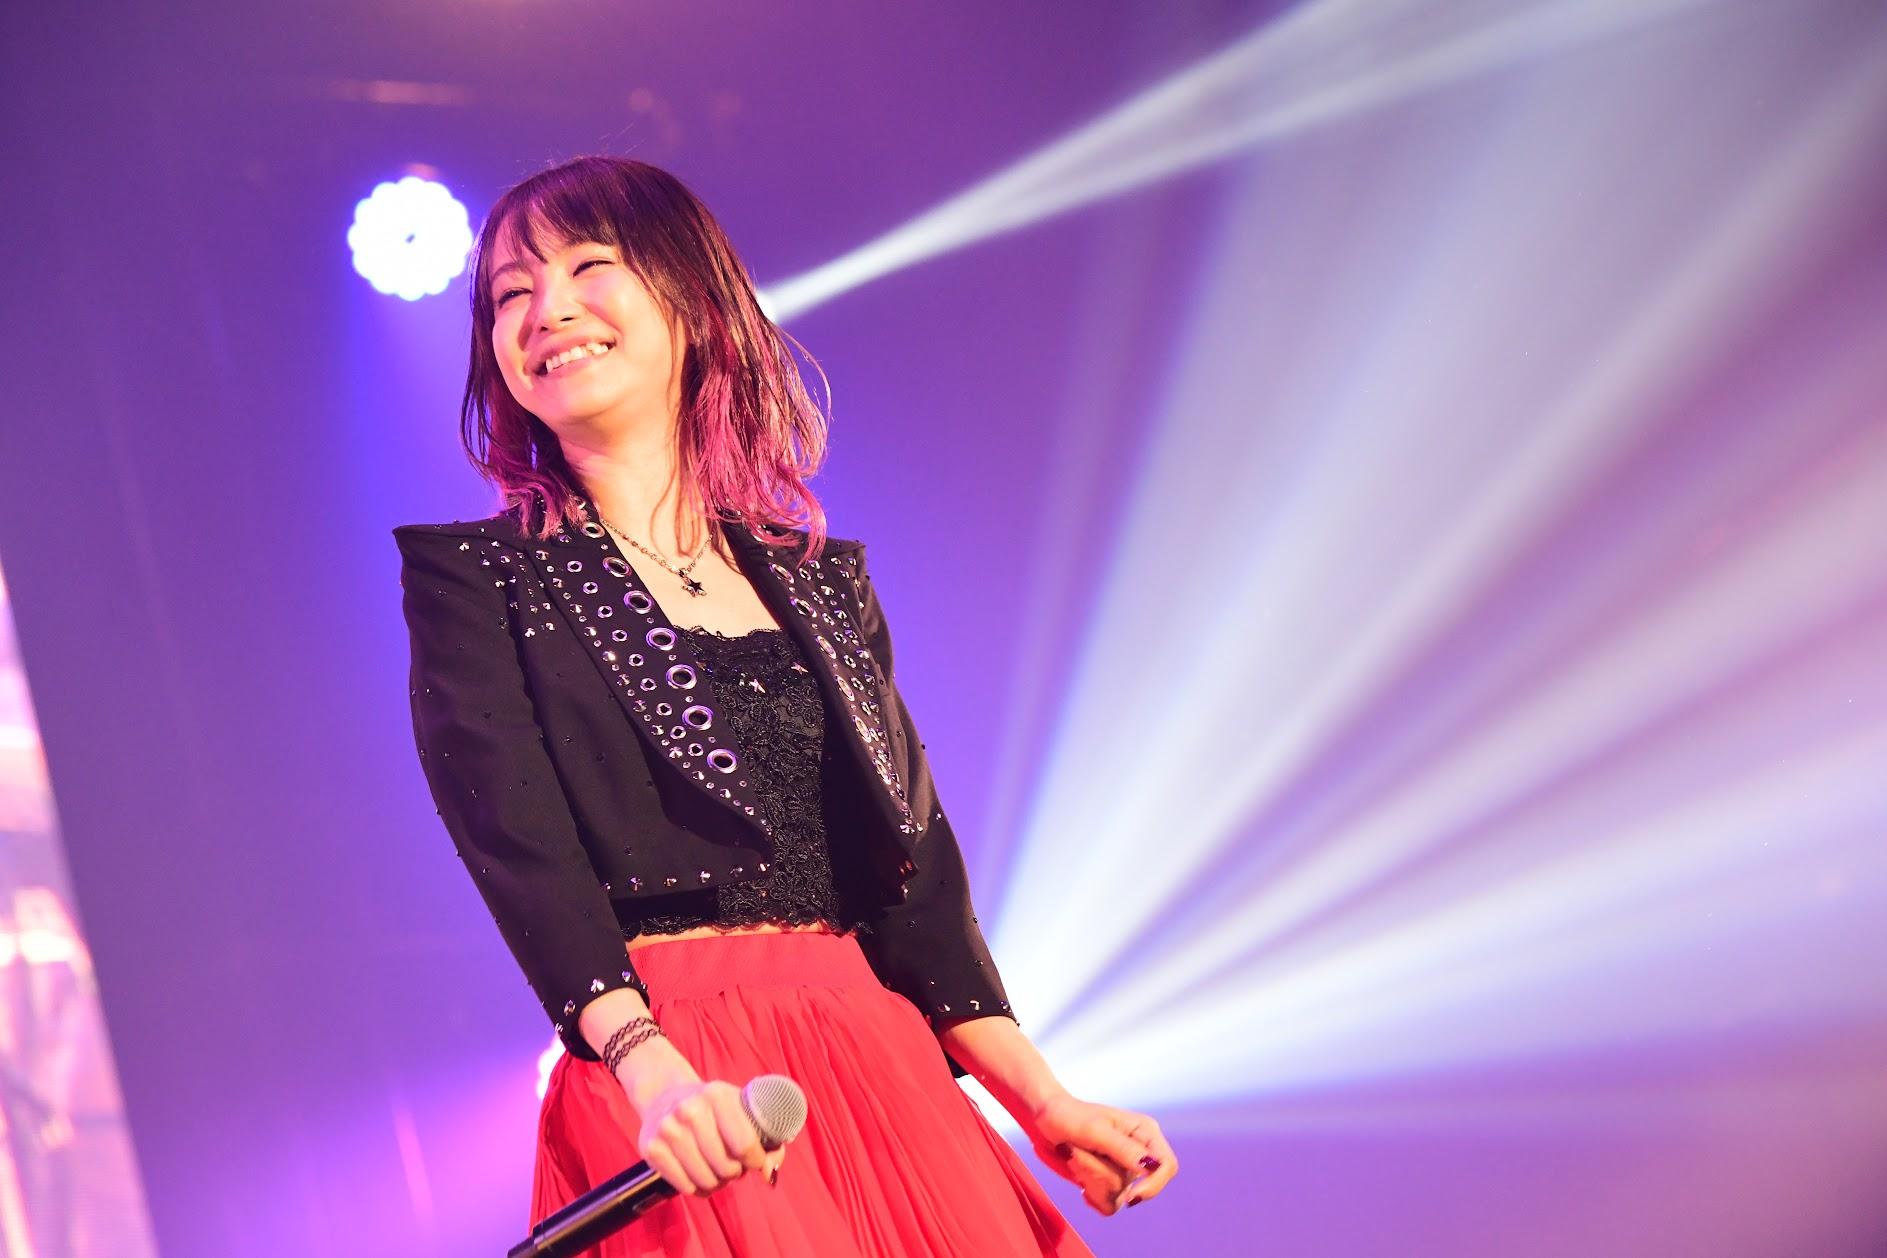 【迷迷現場】COUNTDOWN JAPAN 18/19 LiSA 紅色羽織造型美翻全場